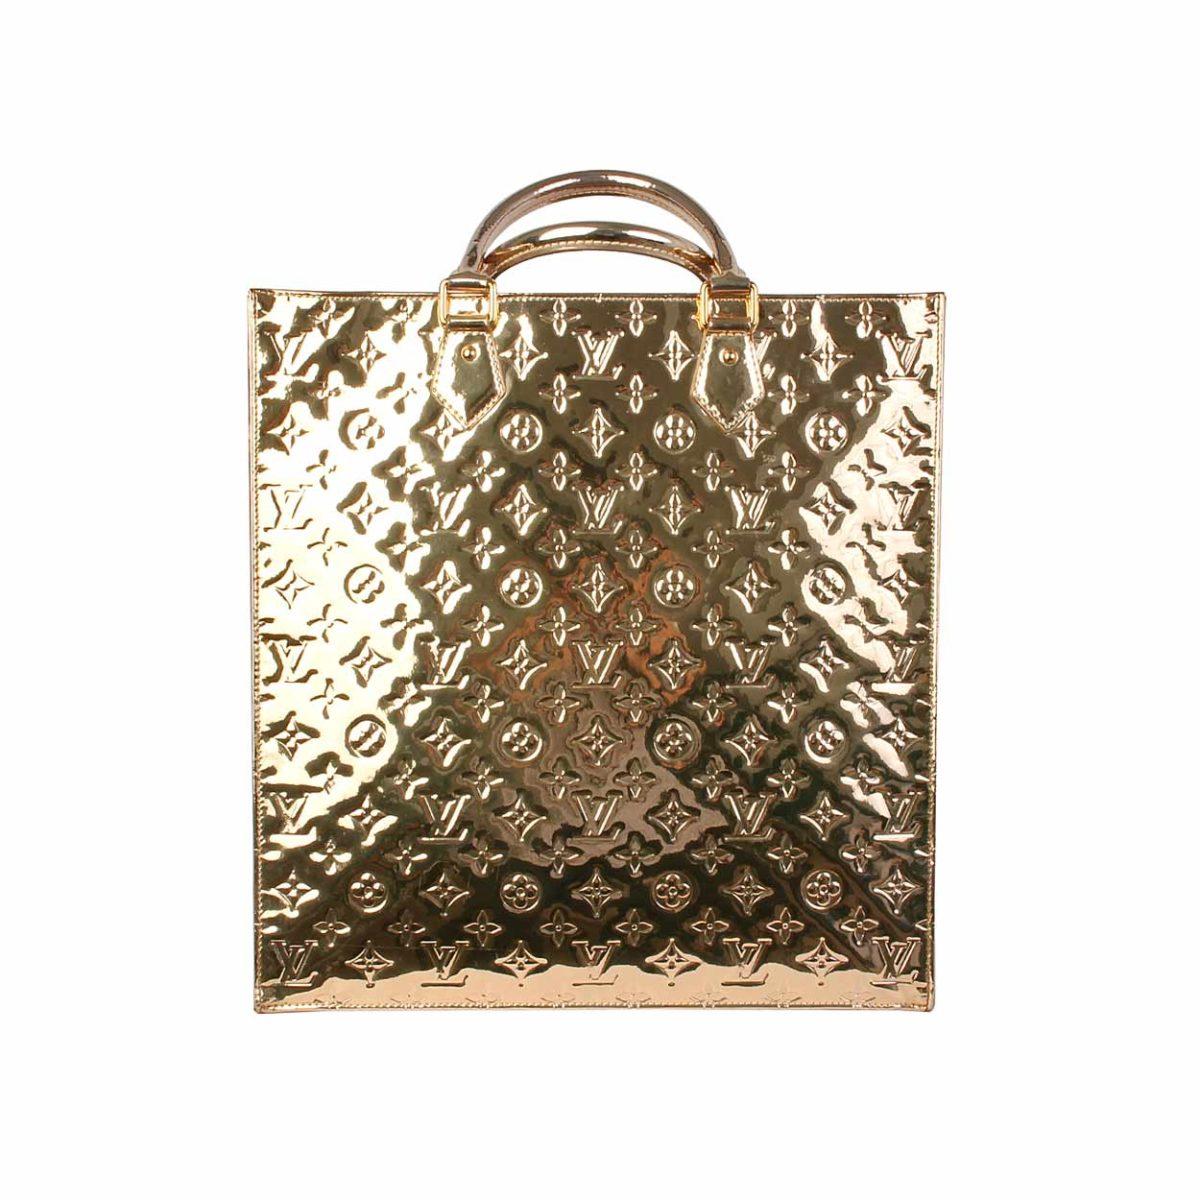 LOUIS VUITTON Monogram Miroir Sac Plat Dore Gold - Limited Edition ... 5a5fbe26443e